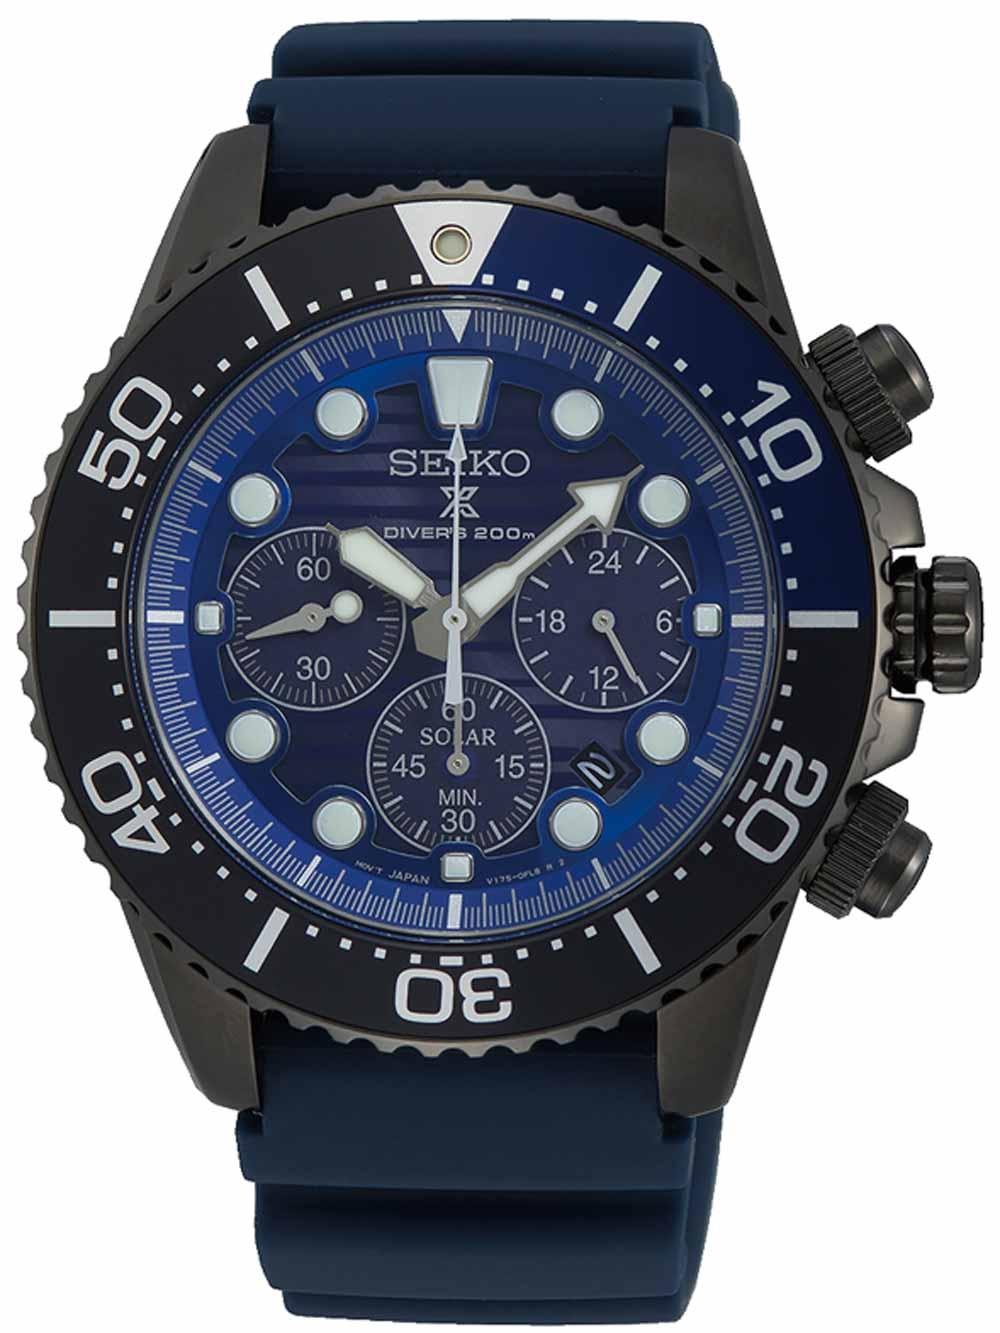 SSC701P1 Prospex Divers Save the ocean Chrono 43mm 20ATM